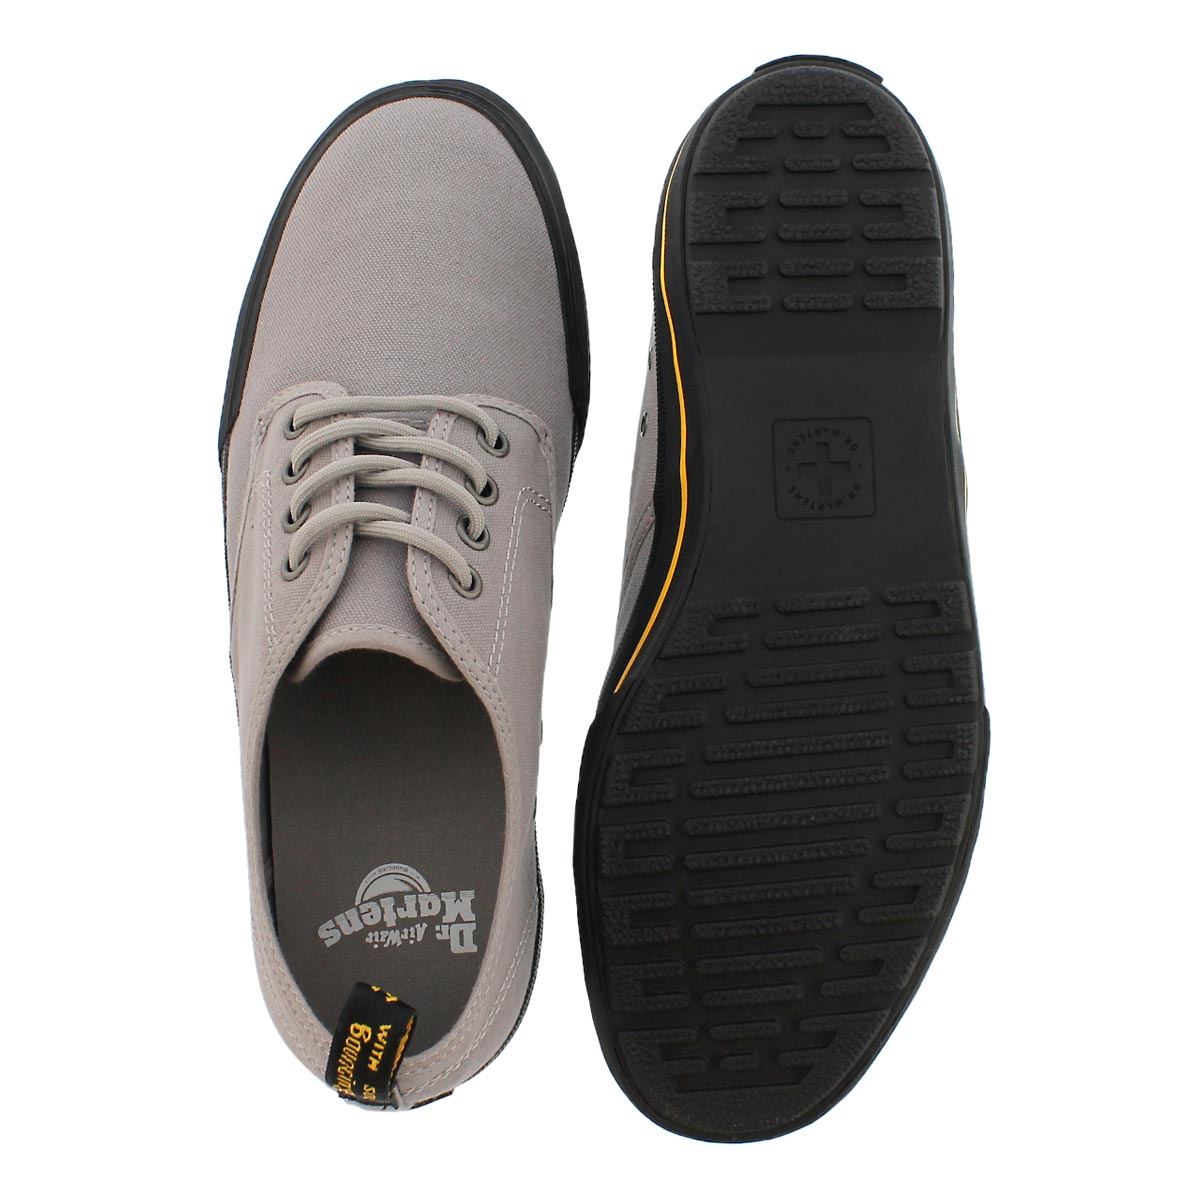 Mns Pressler mid grey lace up sneaker